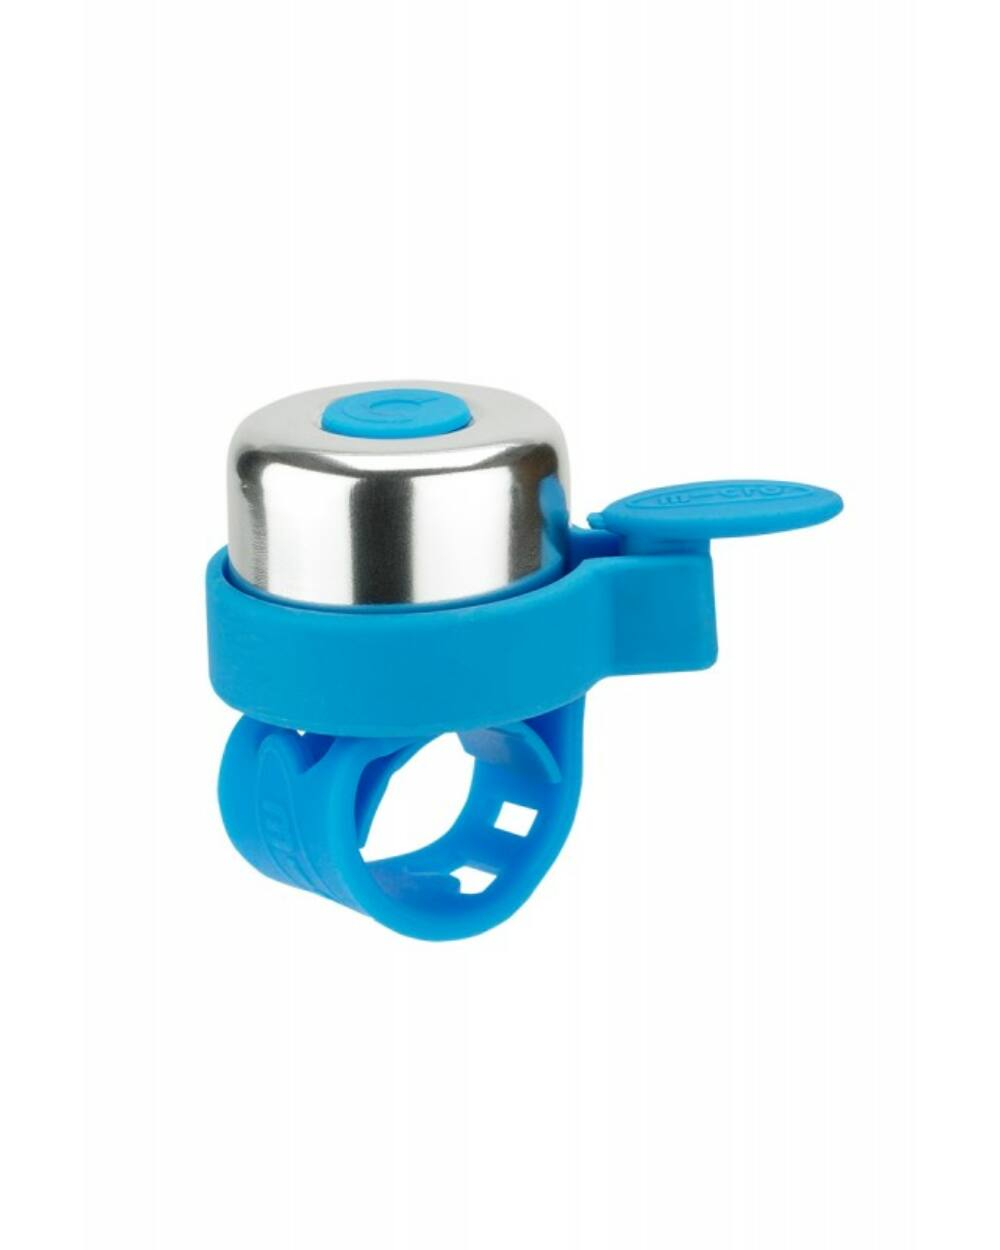 Micro roller csengő, neonkék